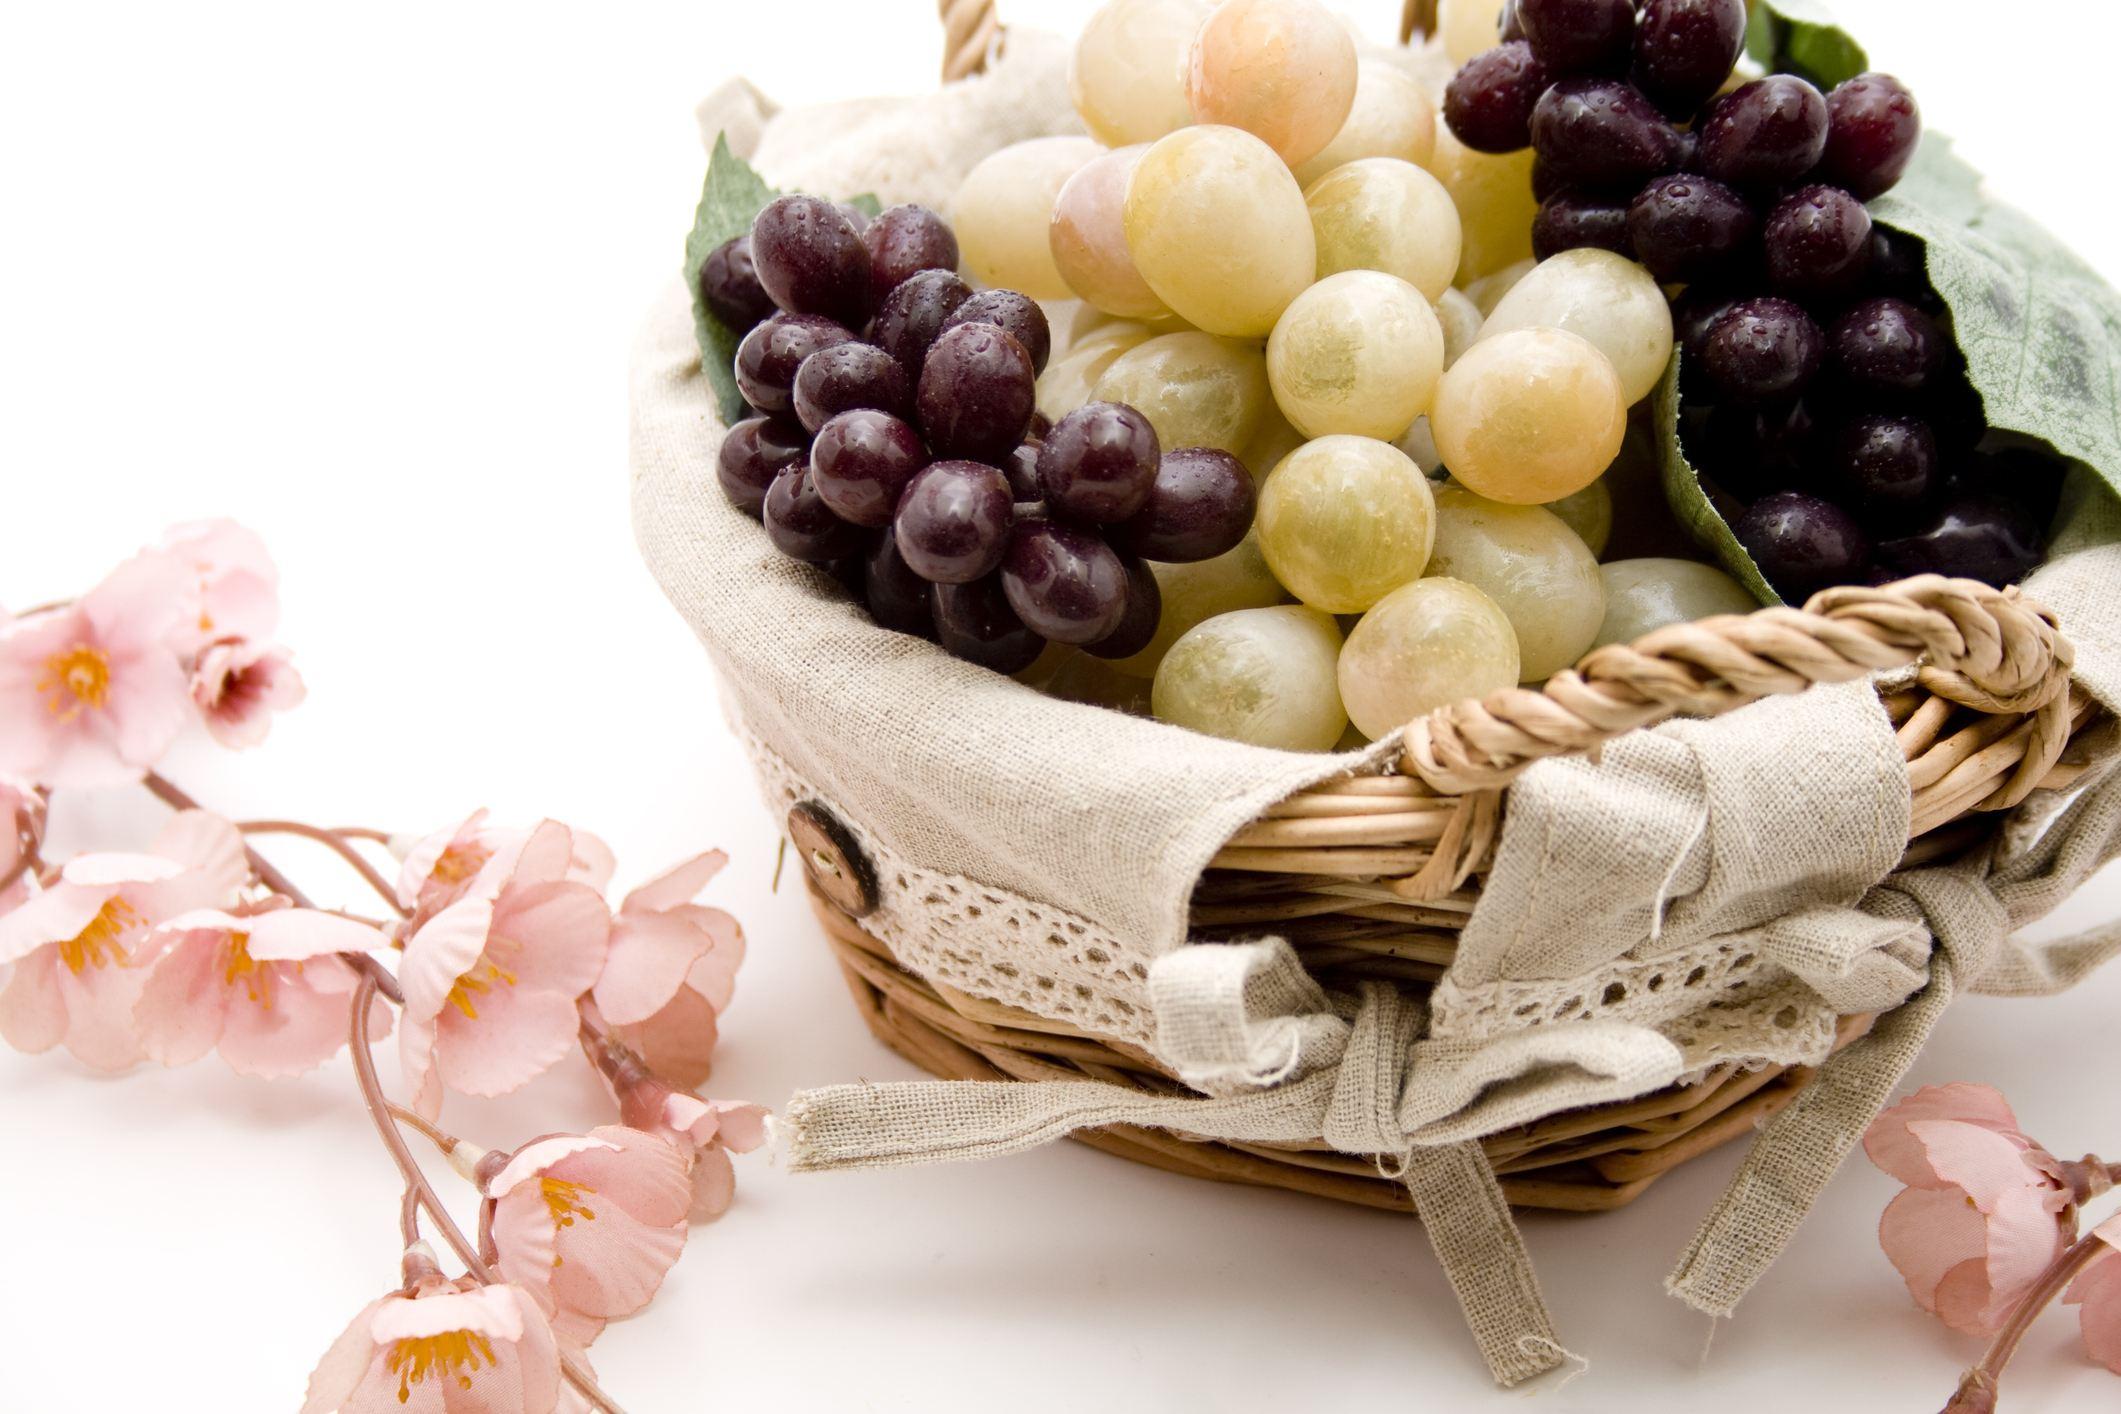 Fake grapes in bowl